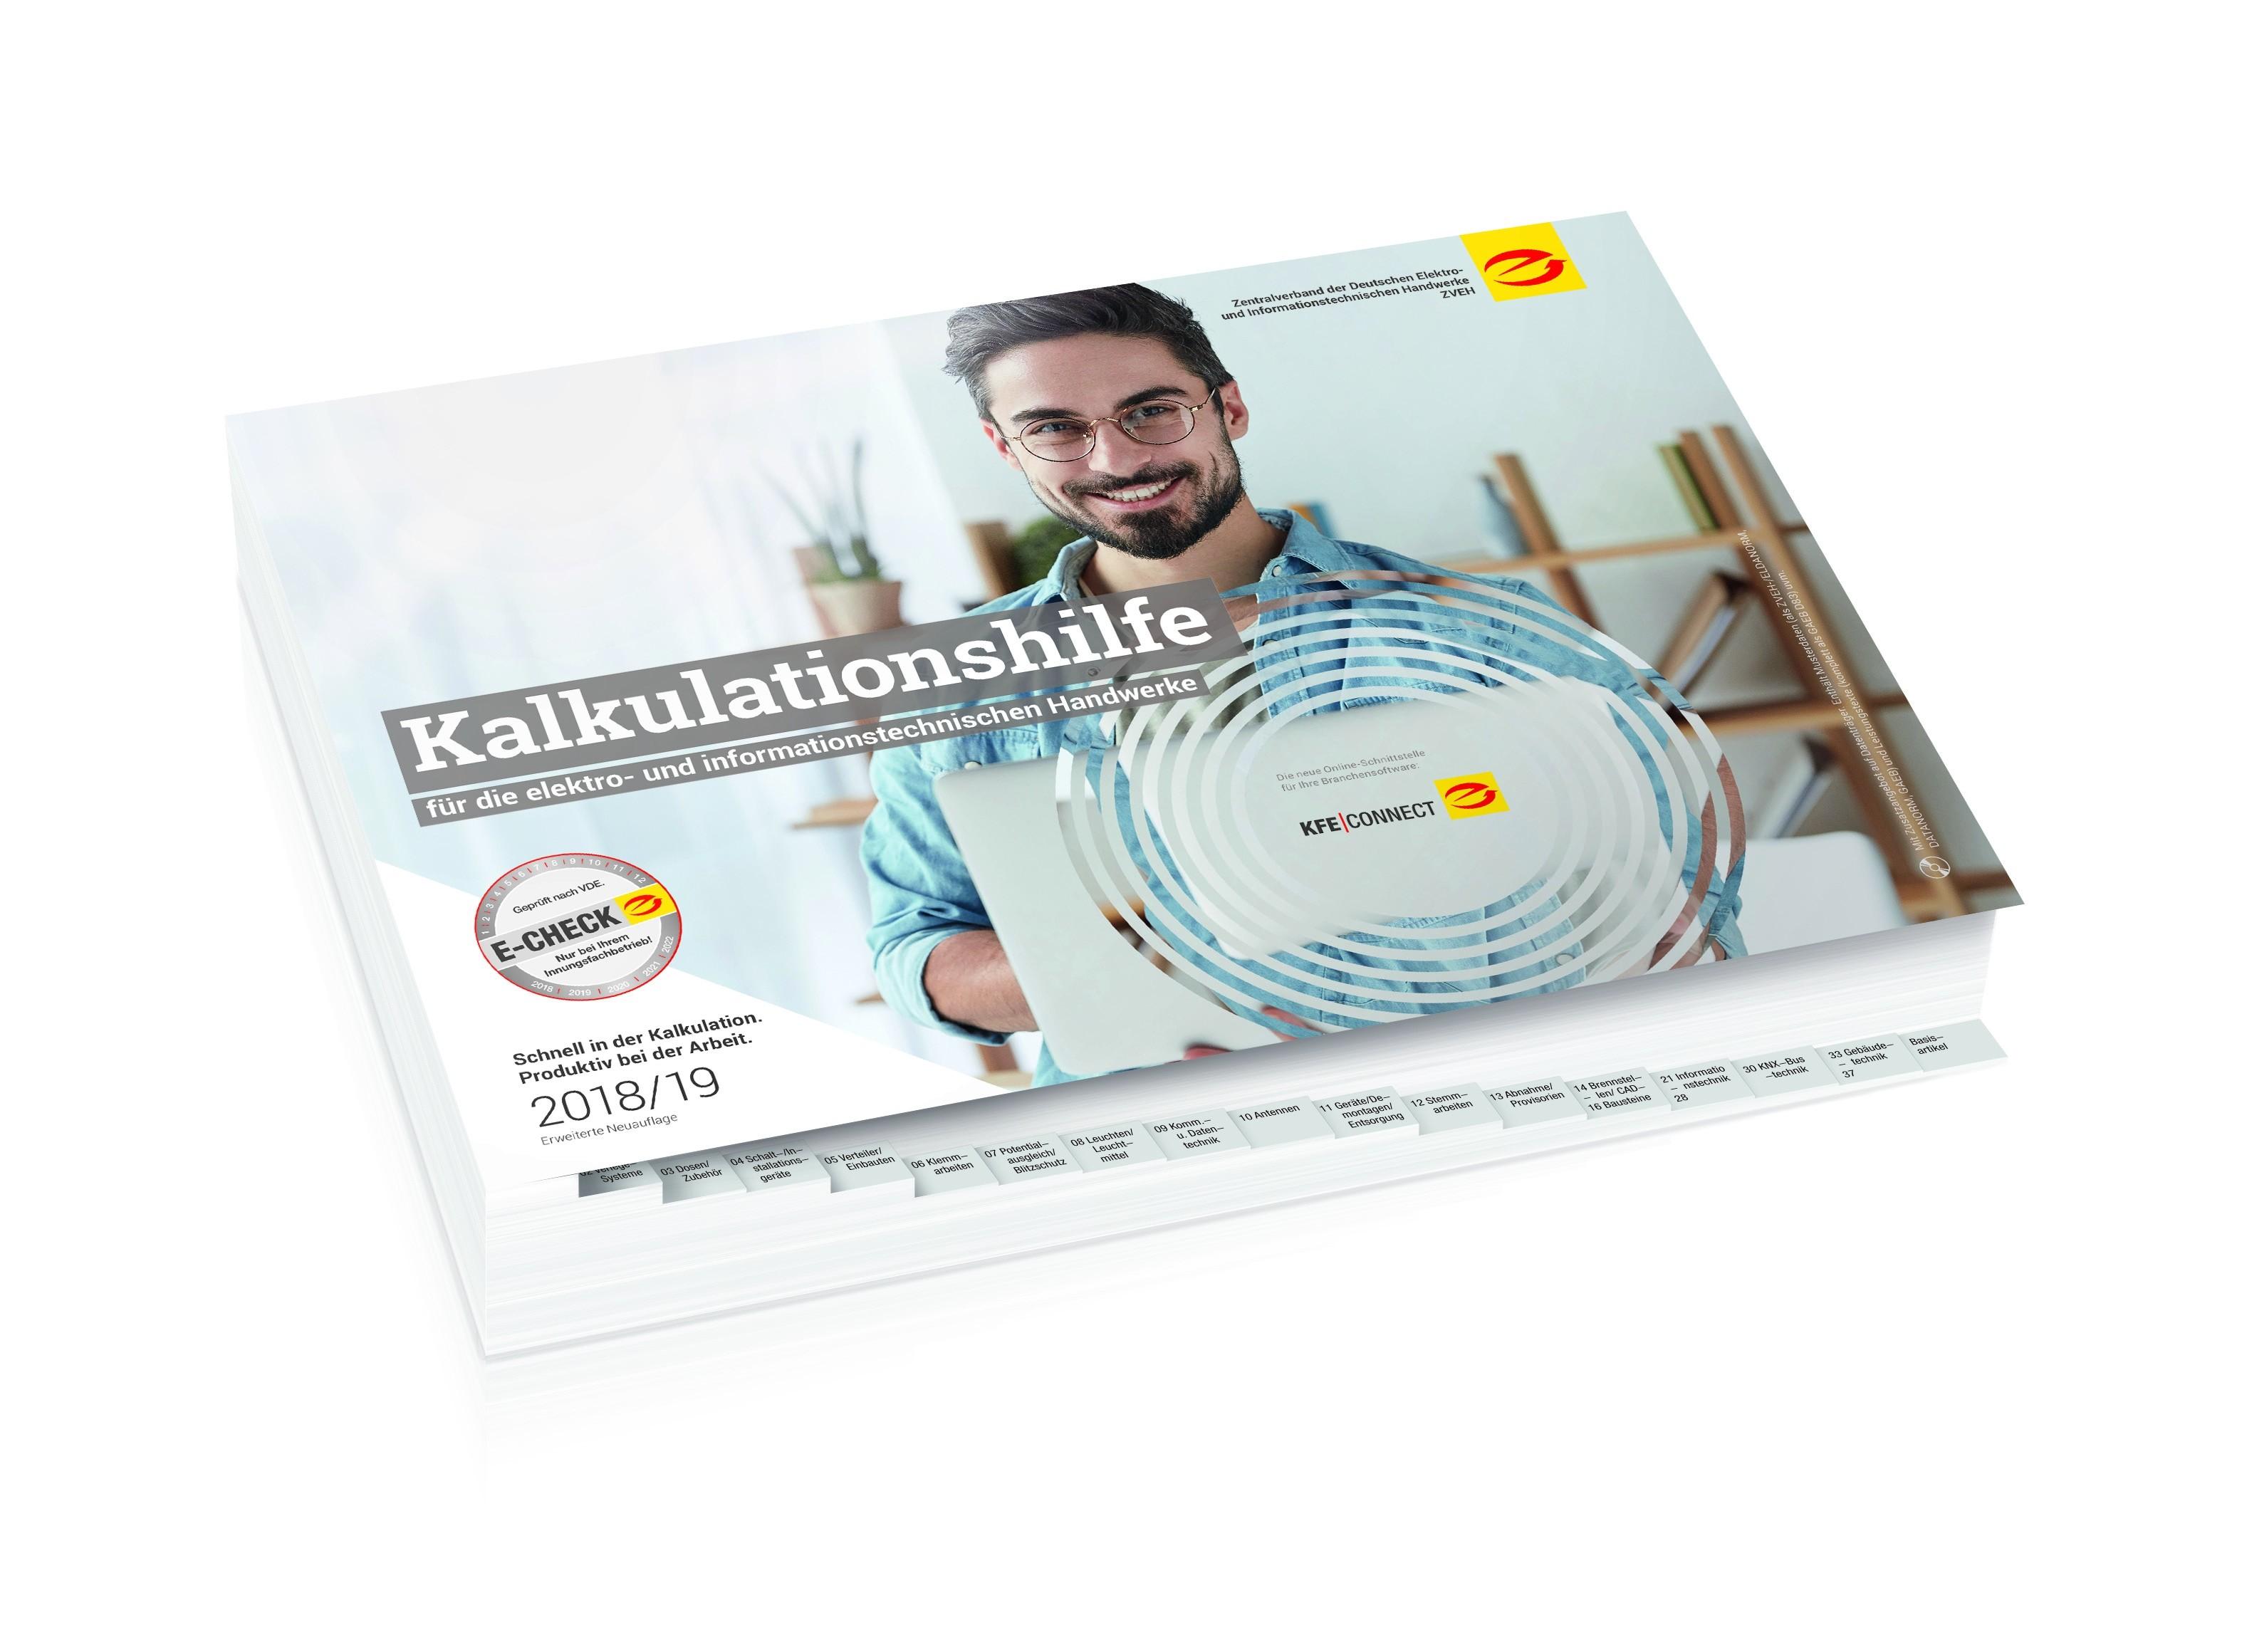 Kalkulationshilfe Buchausgabe 2018 / 19